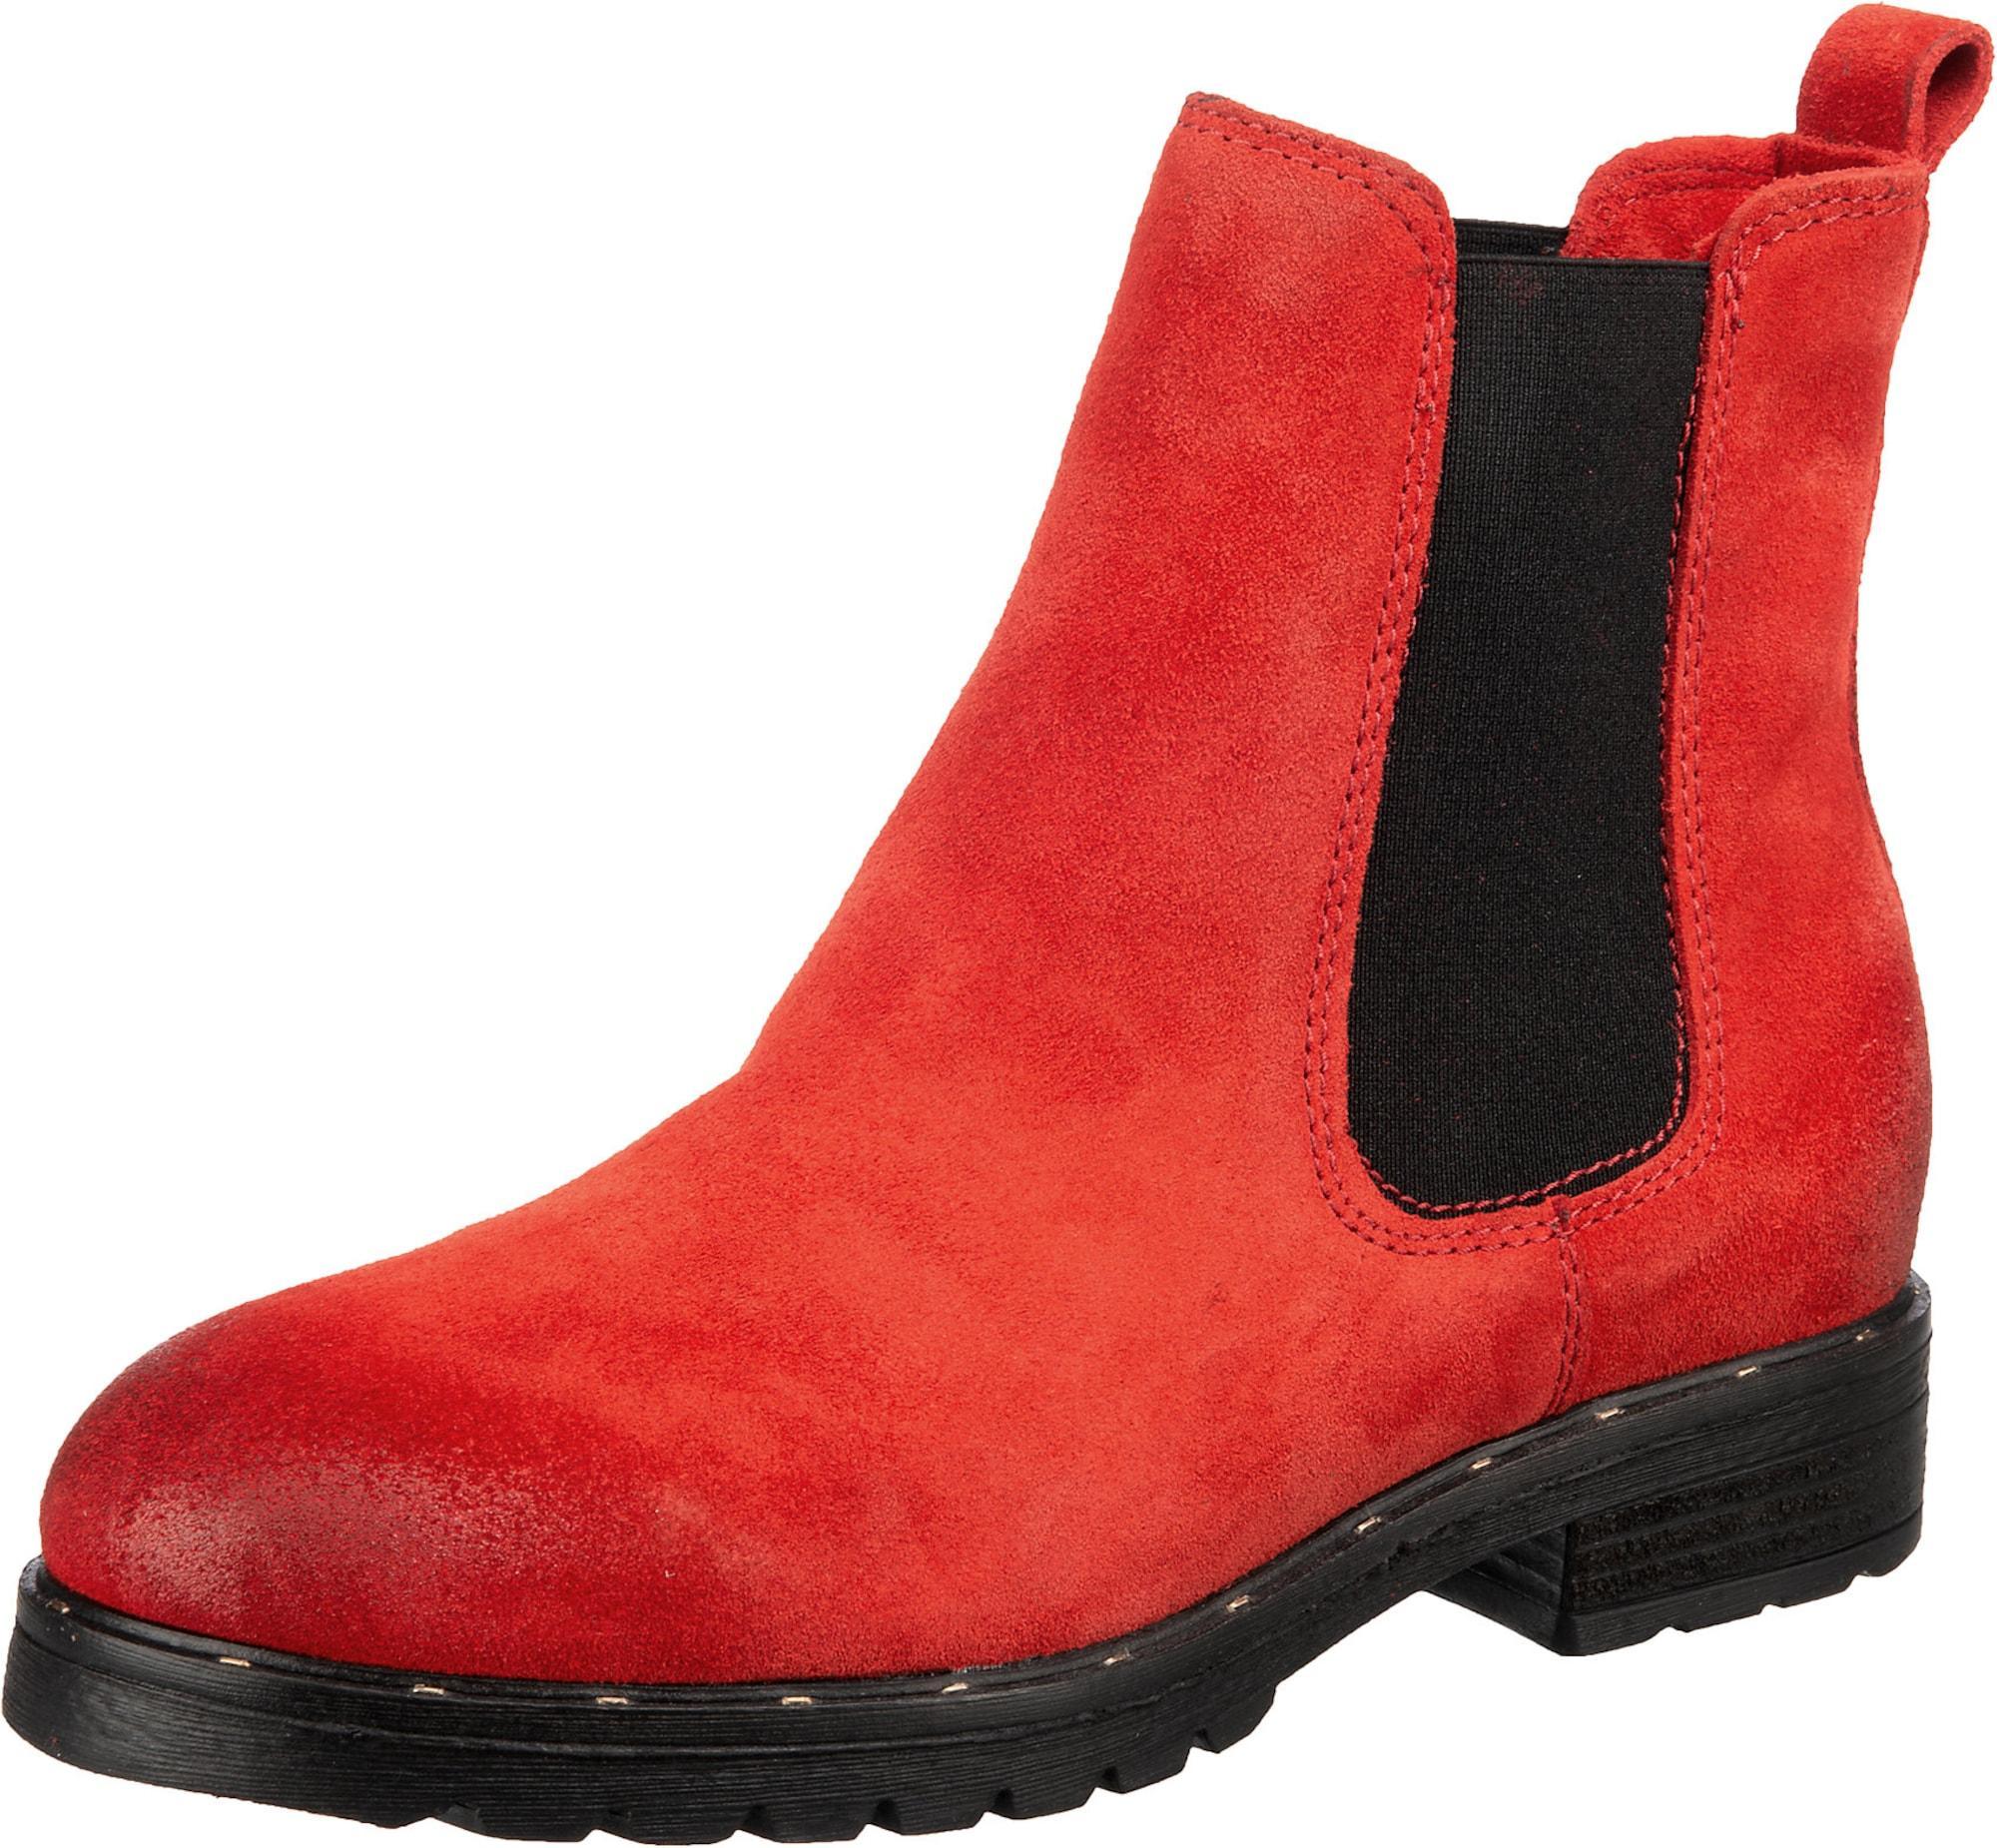 Mirapodo Schuh rot / schwarz